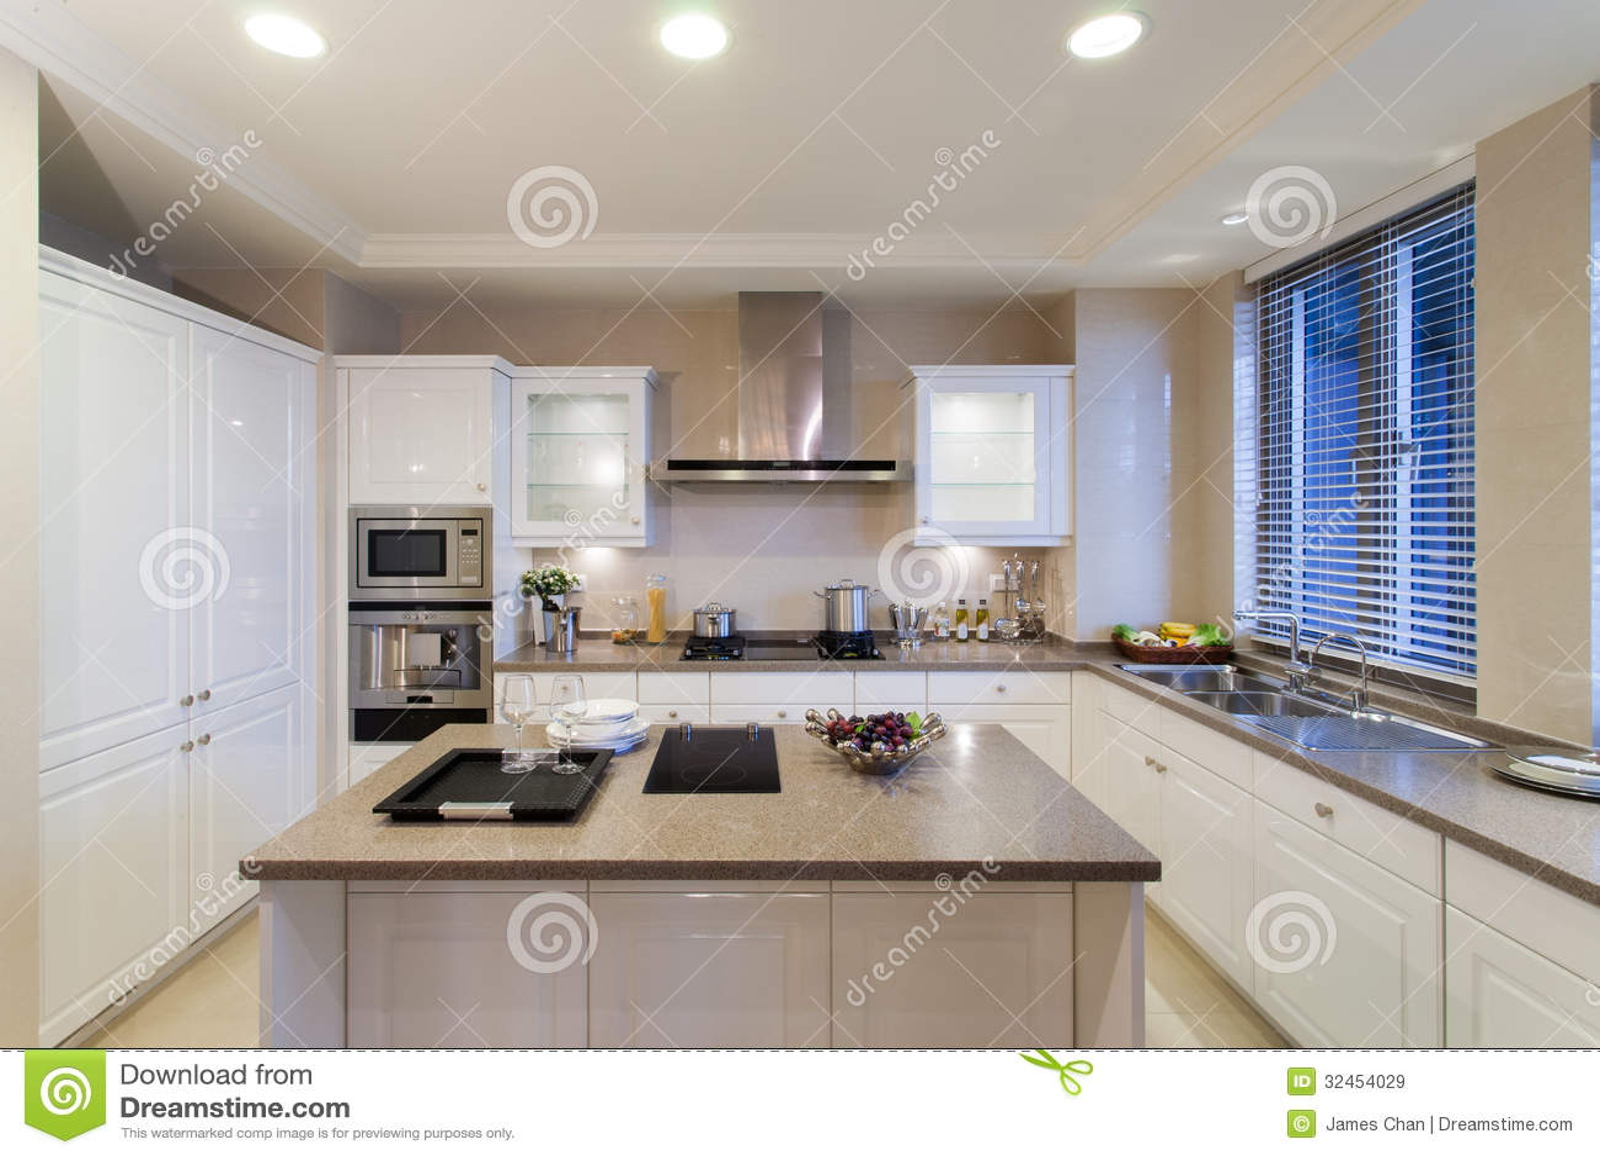 Moderne keuken stock afbeelding afbeelding bestaande uit binnen 32454029 - Afbeelding moderne keuken ...